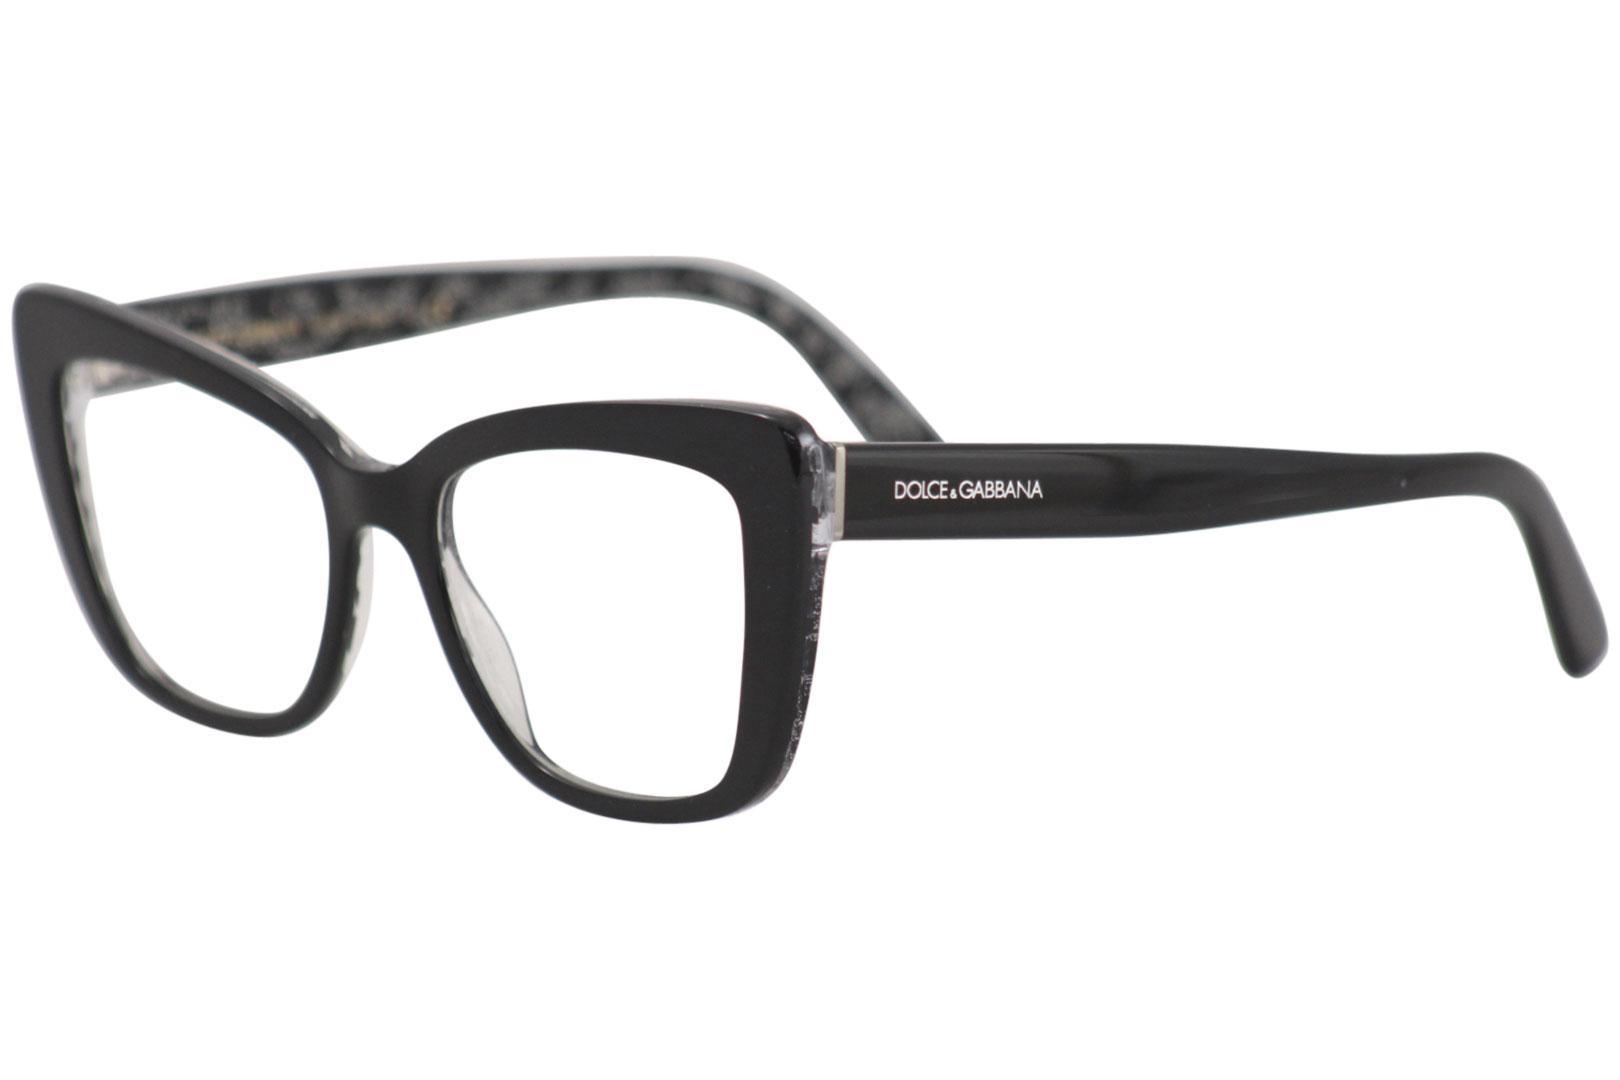 204c962e70 Dolce & Gabbana Eyeglasses D&G DG3308 3308 3203 Black/Silver Optical ...